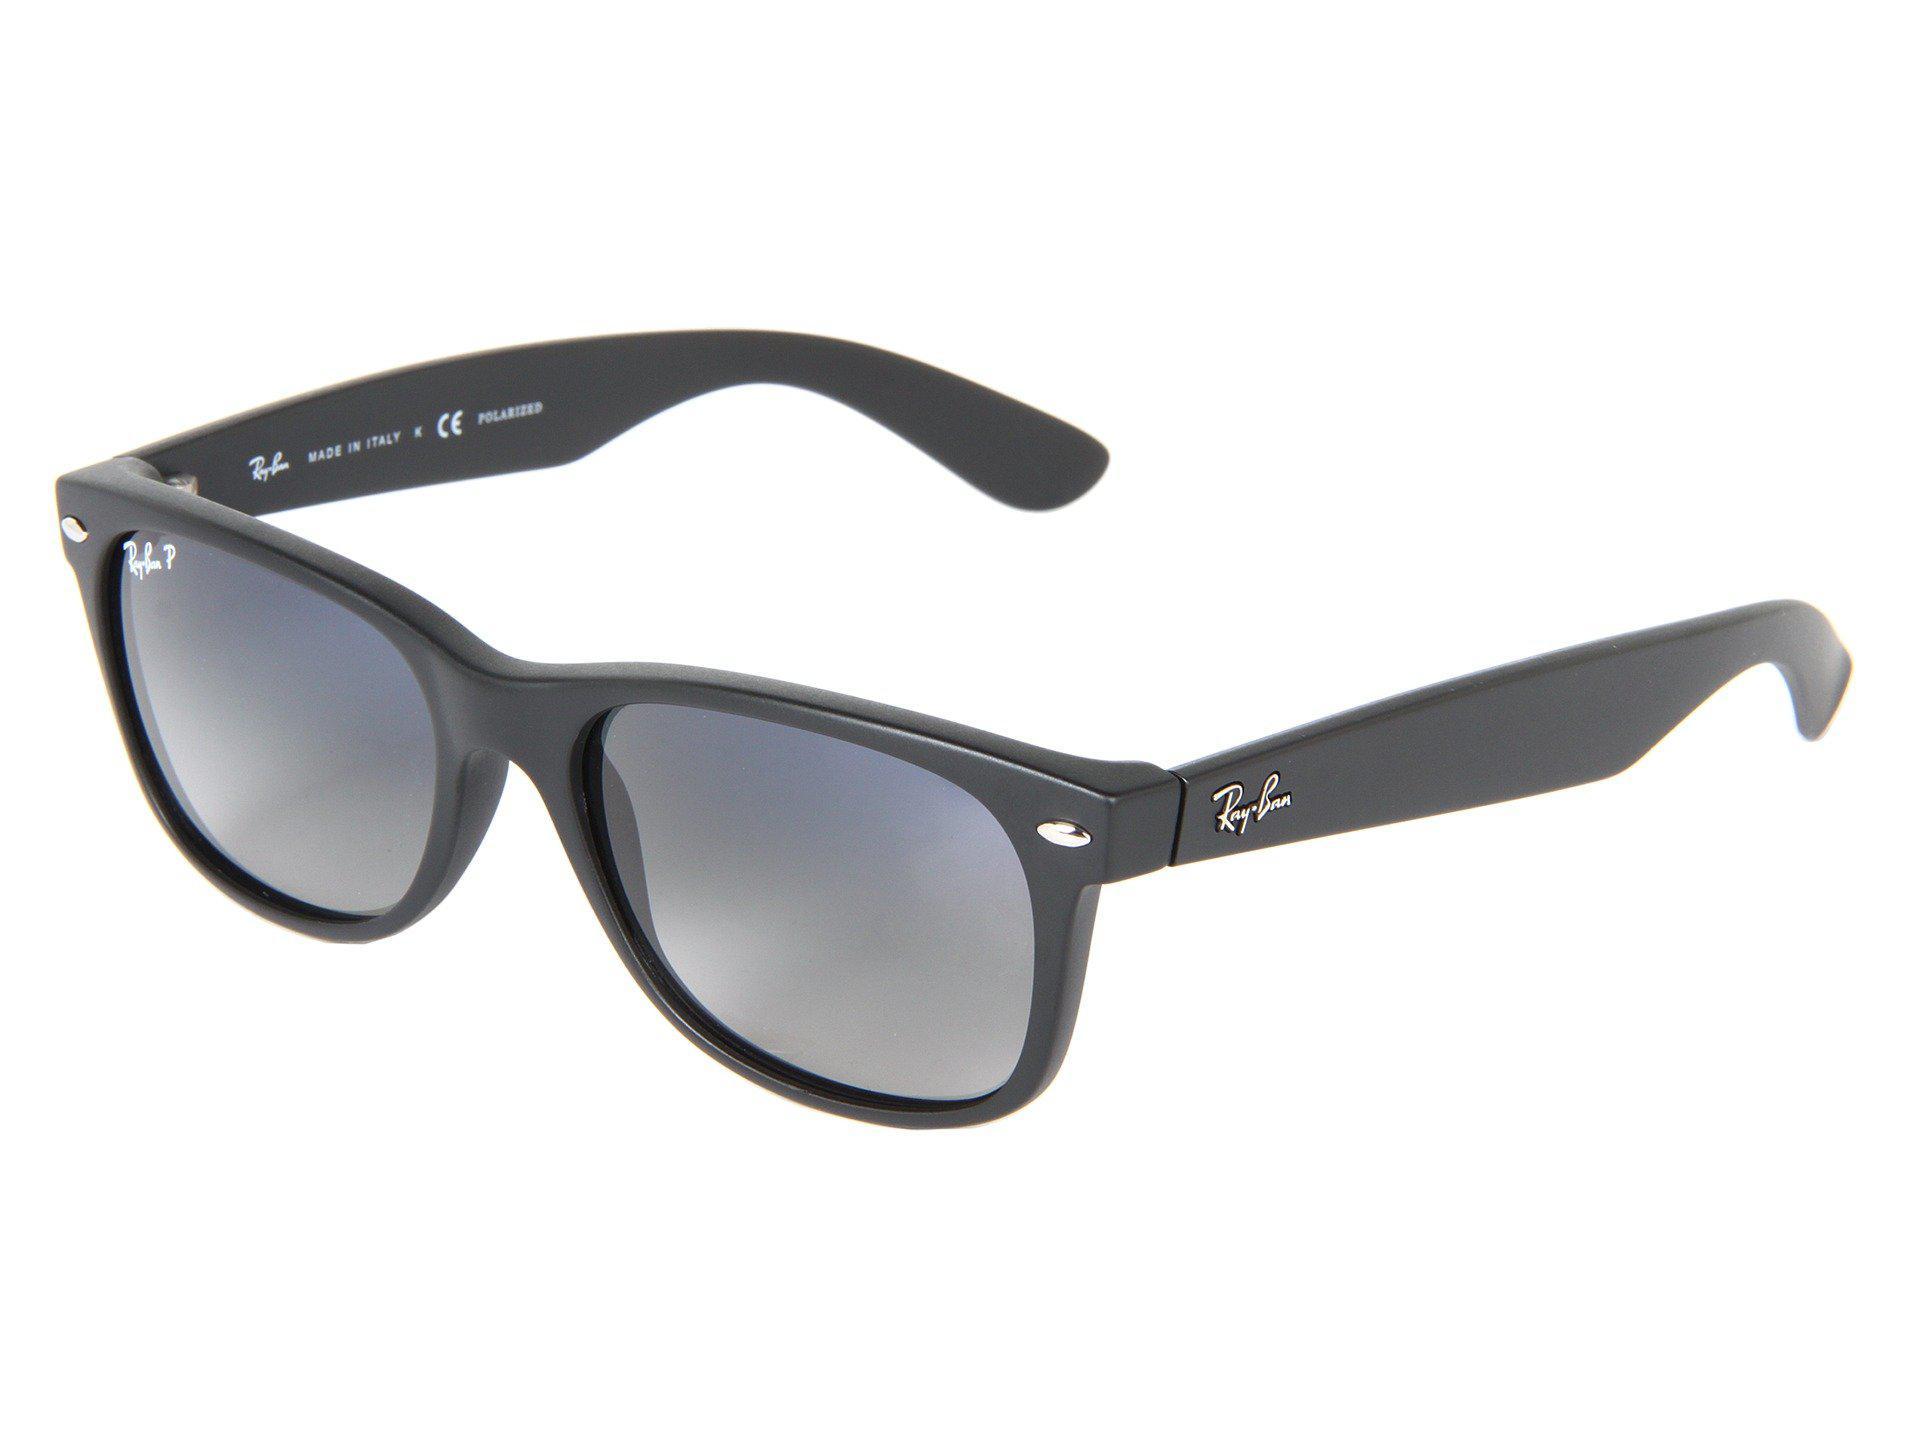 fd72a227b59 Ray-Ban. Women s Black Rb2132 New Wayfarer Polarized 55mm (tortoise crystal Green  Polarized Lens) Fashion Sunglasses